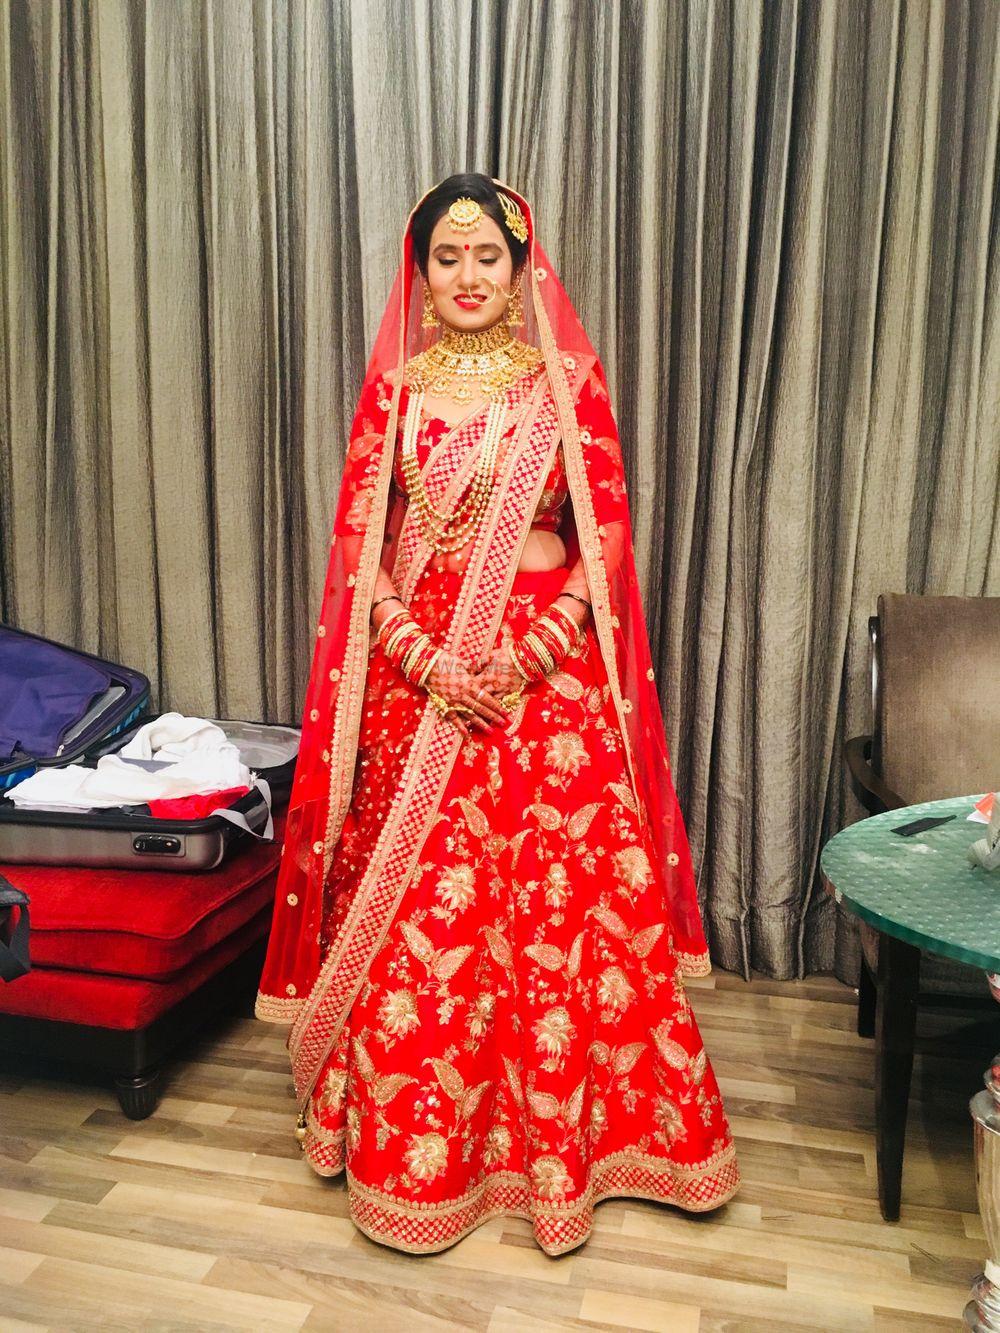 Photo From Dr. Aparna  - By Yogesh Sharma Make Up Artist